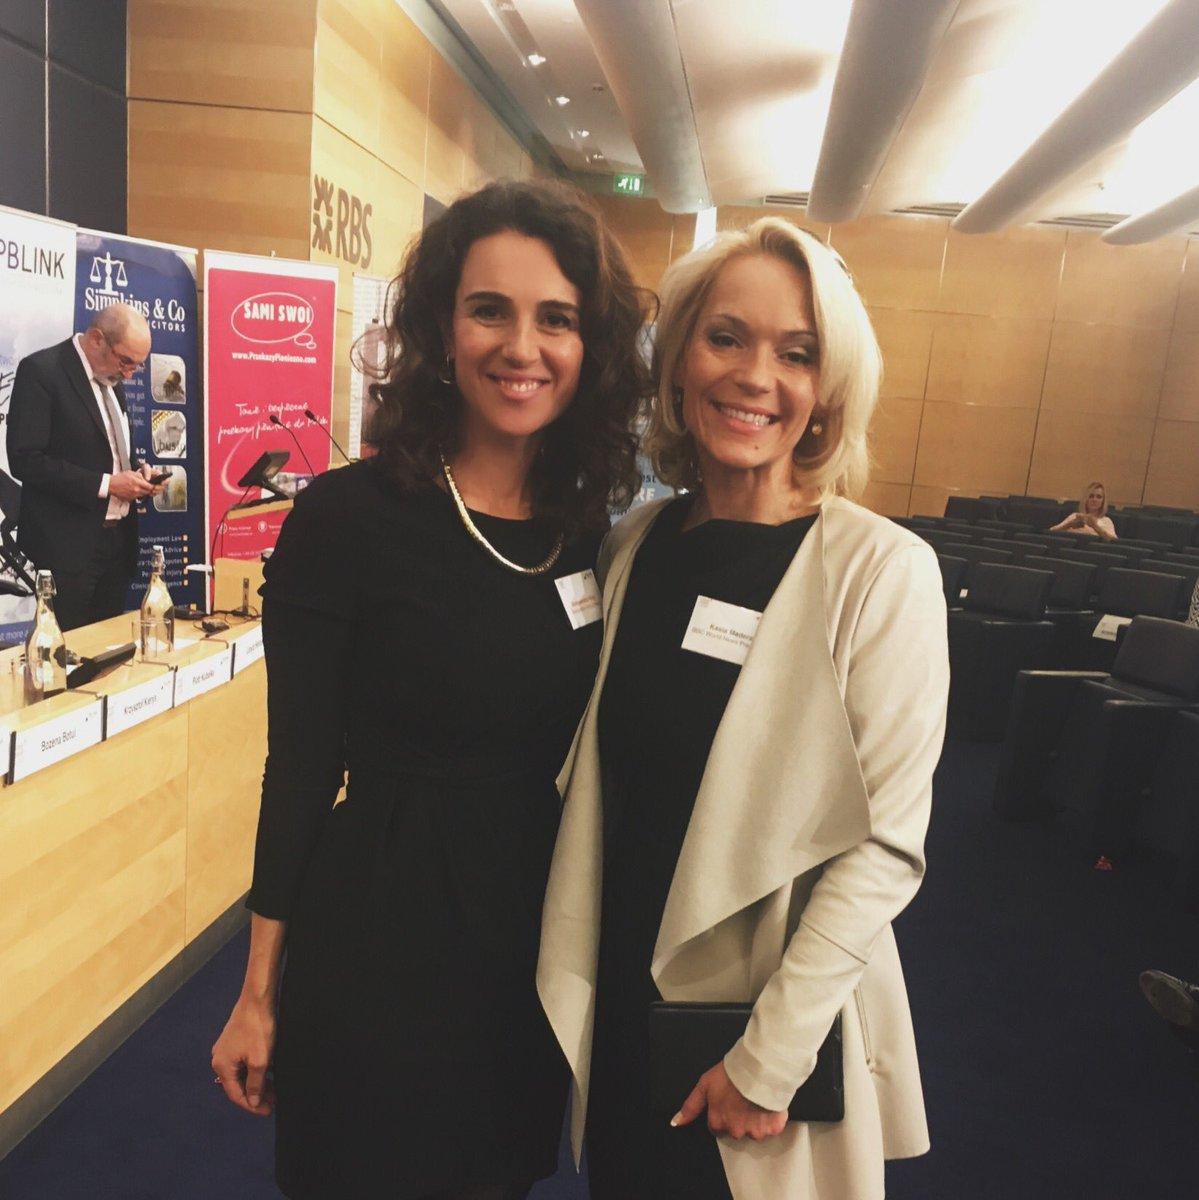 Delighted to speak at PBLink Congress 2016 alongside BBC World News Presenter, Kasia Madera